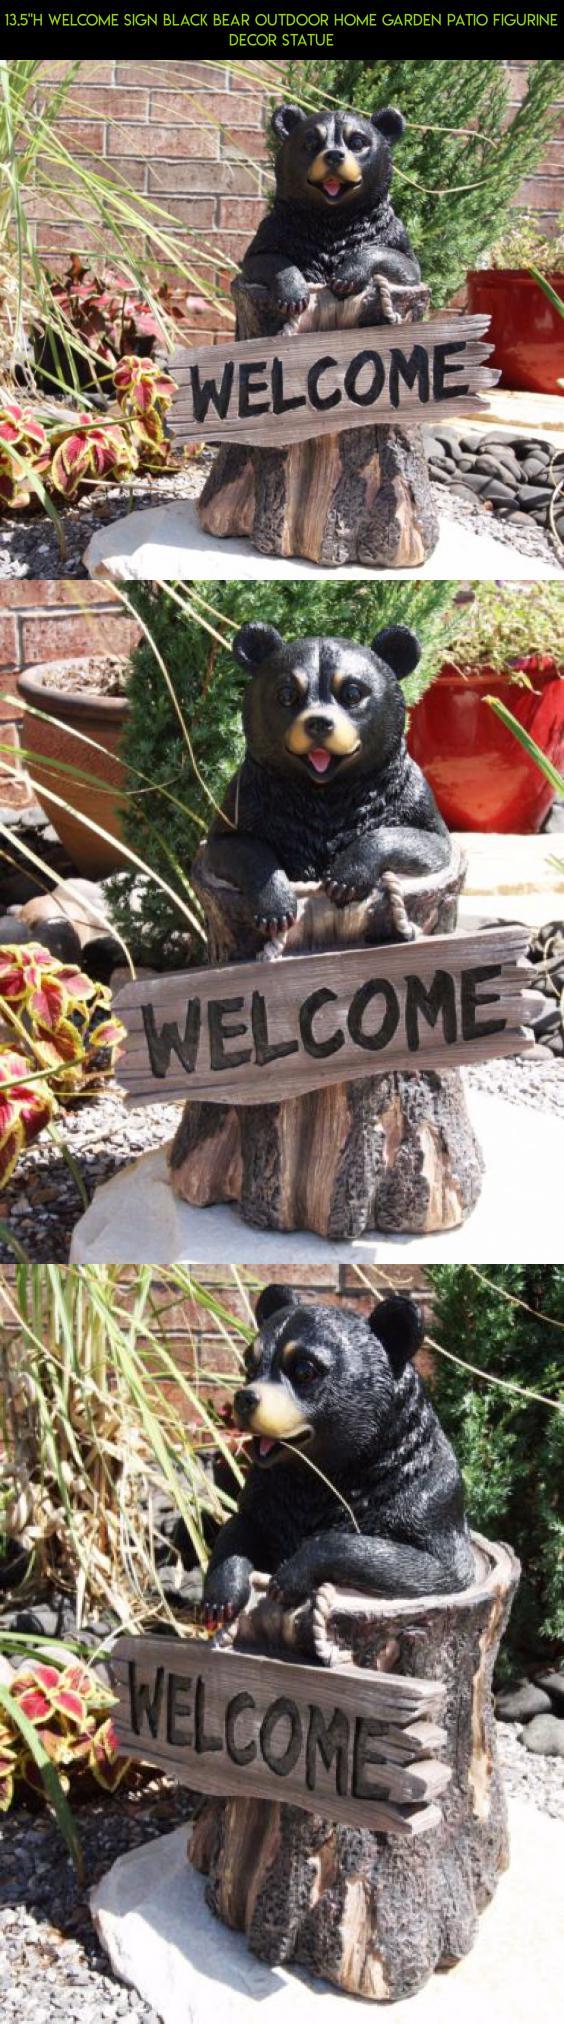 13 5 H Welcome Sign Black Bear Outdoor Home Garden Patio Figurine